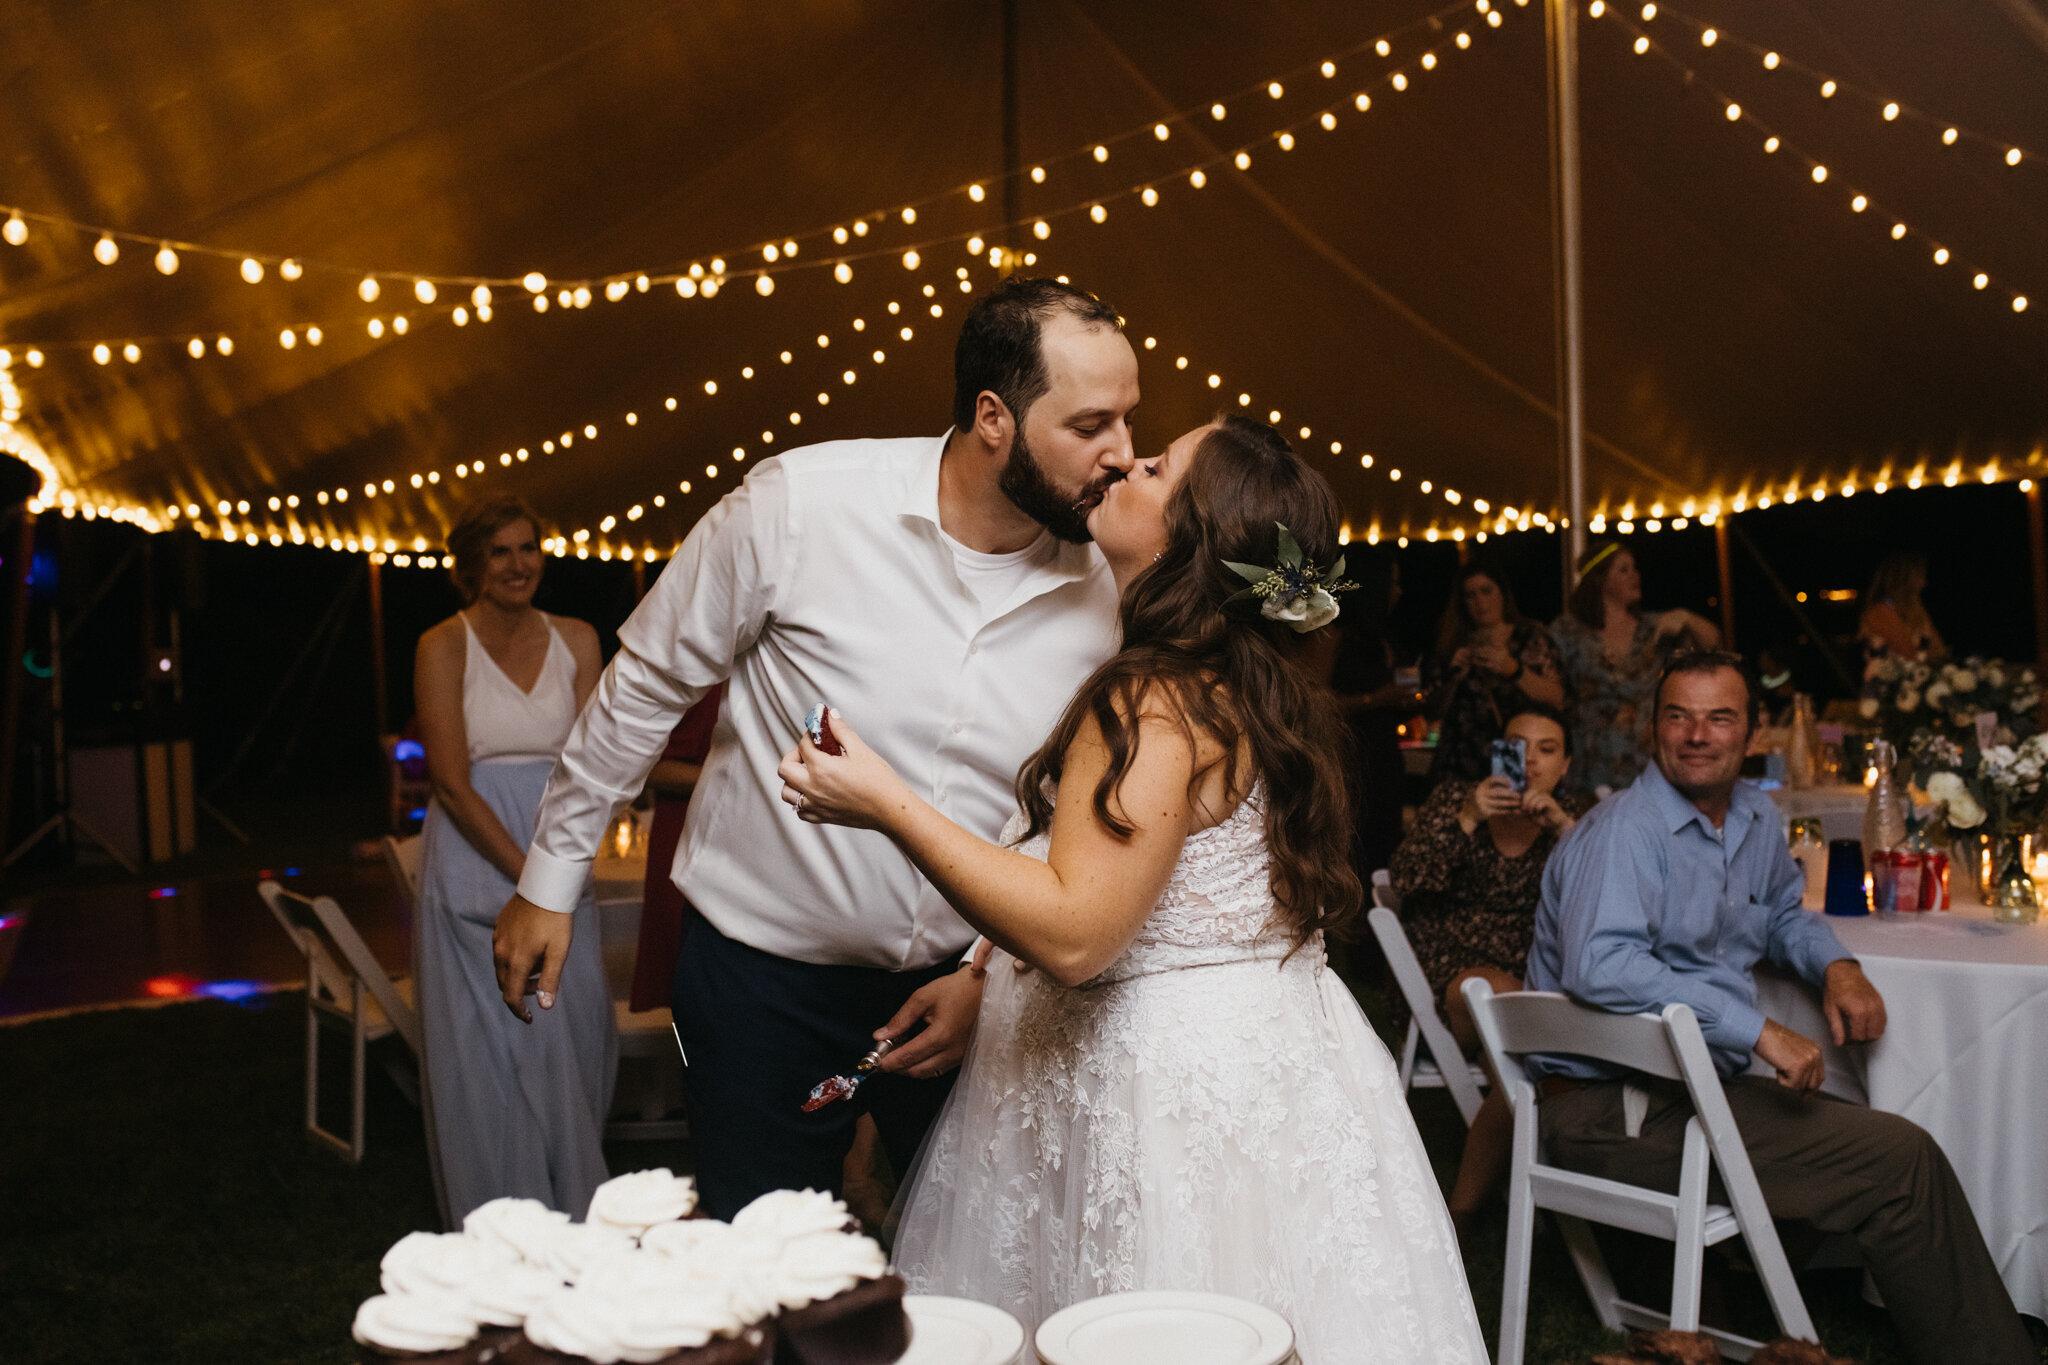 angela_jason_norfolk_wedding-182.jpg